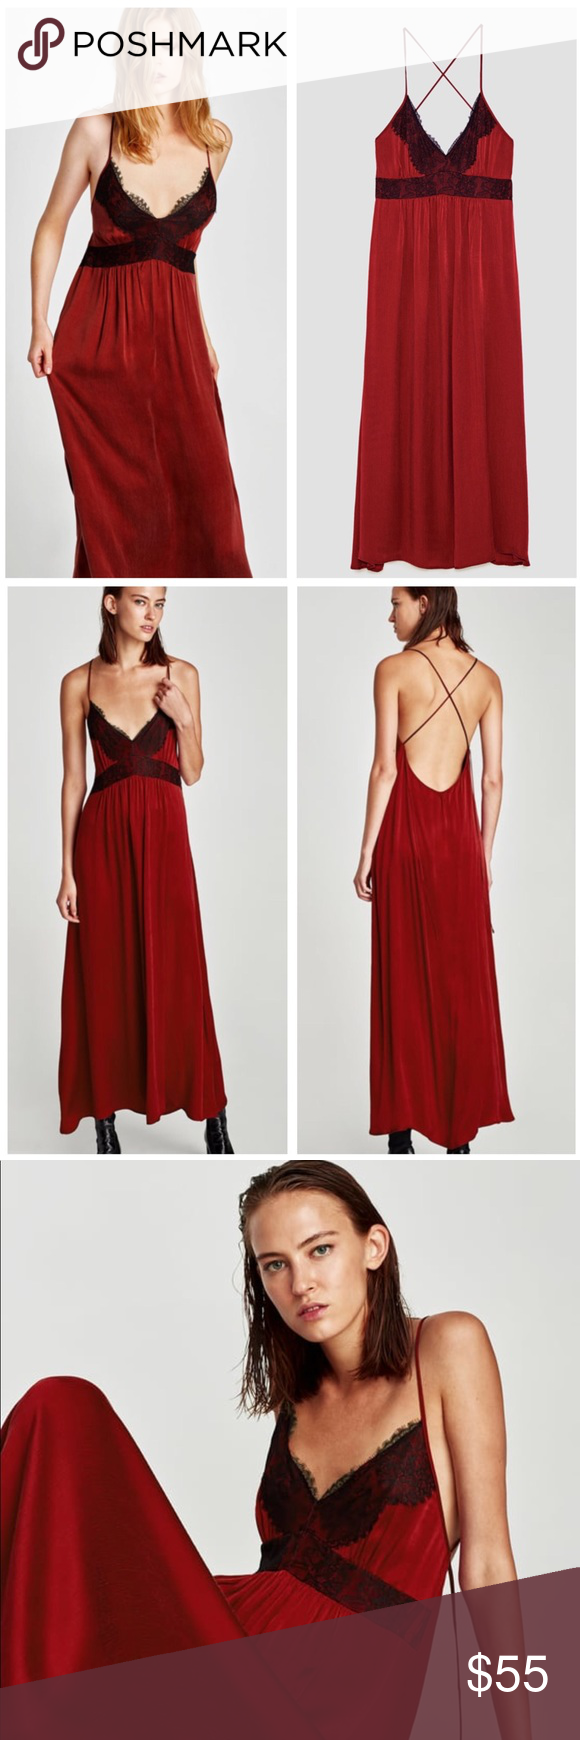 Zara Plus Size Red Camisole Lace Slip Dress Lace Lace Slip Dress